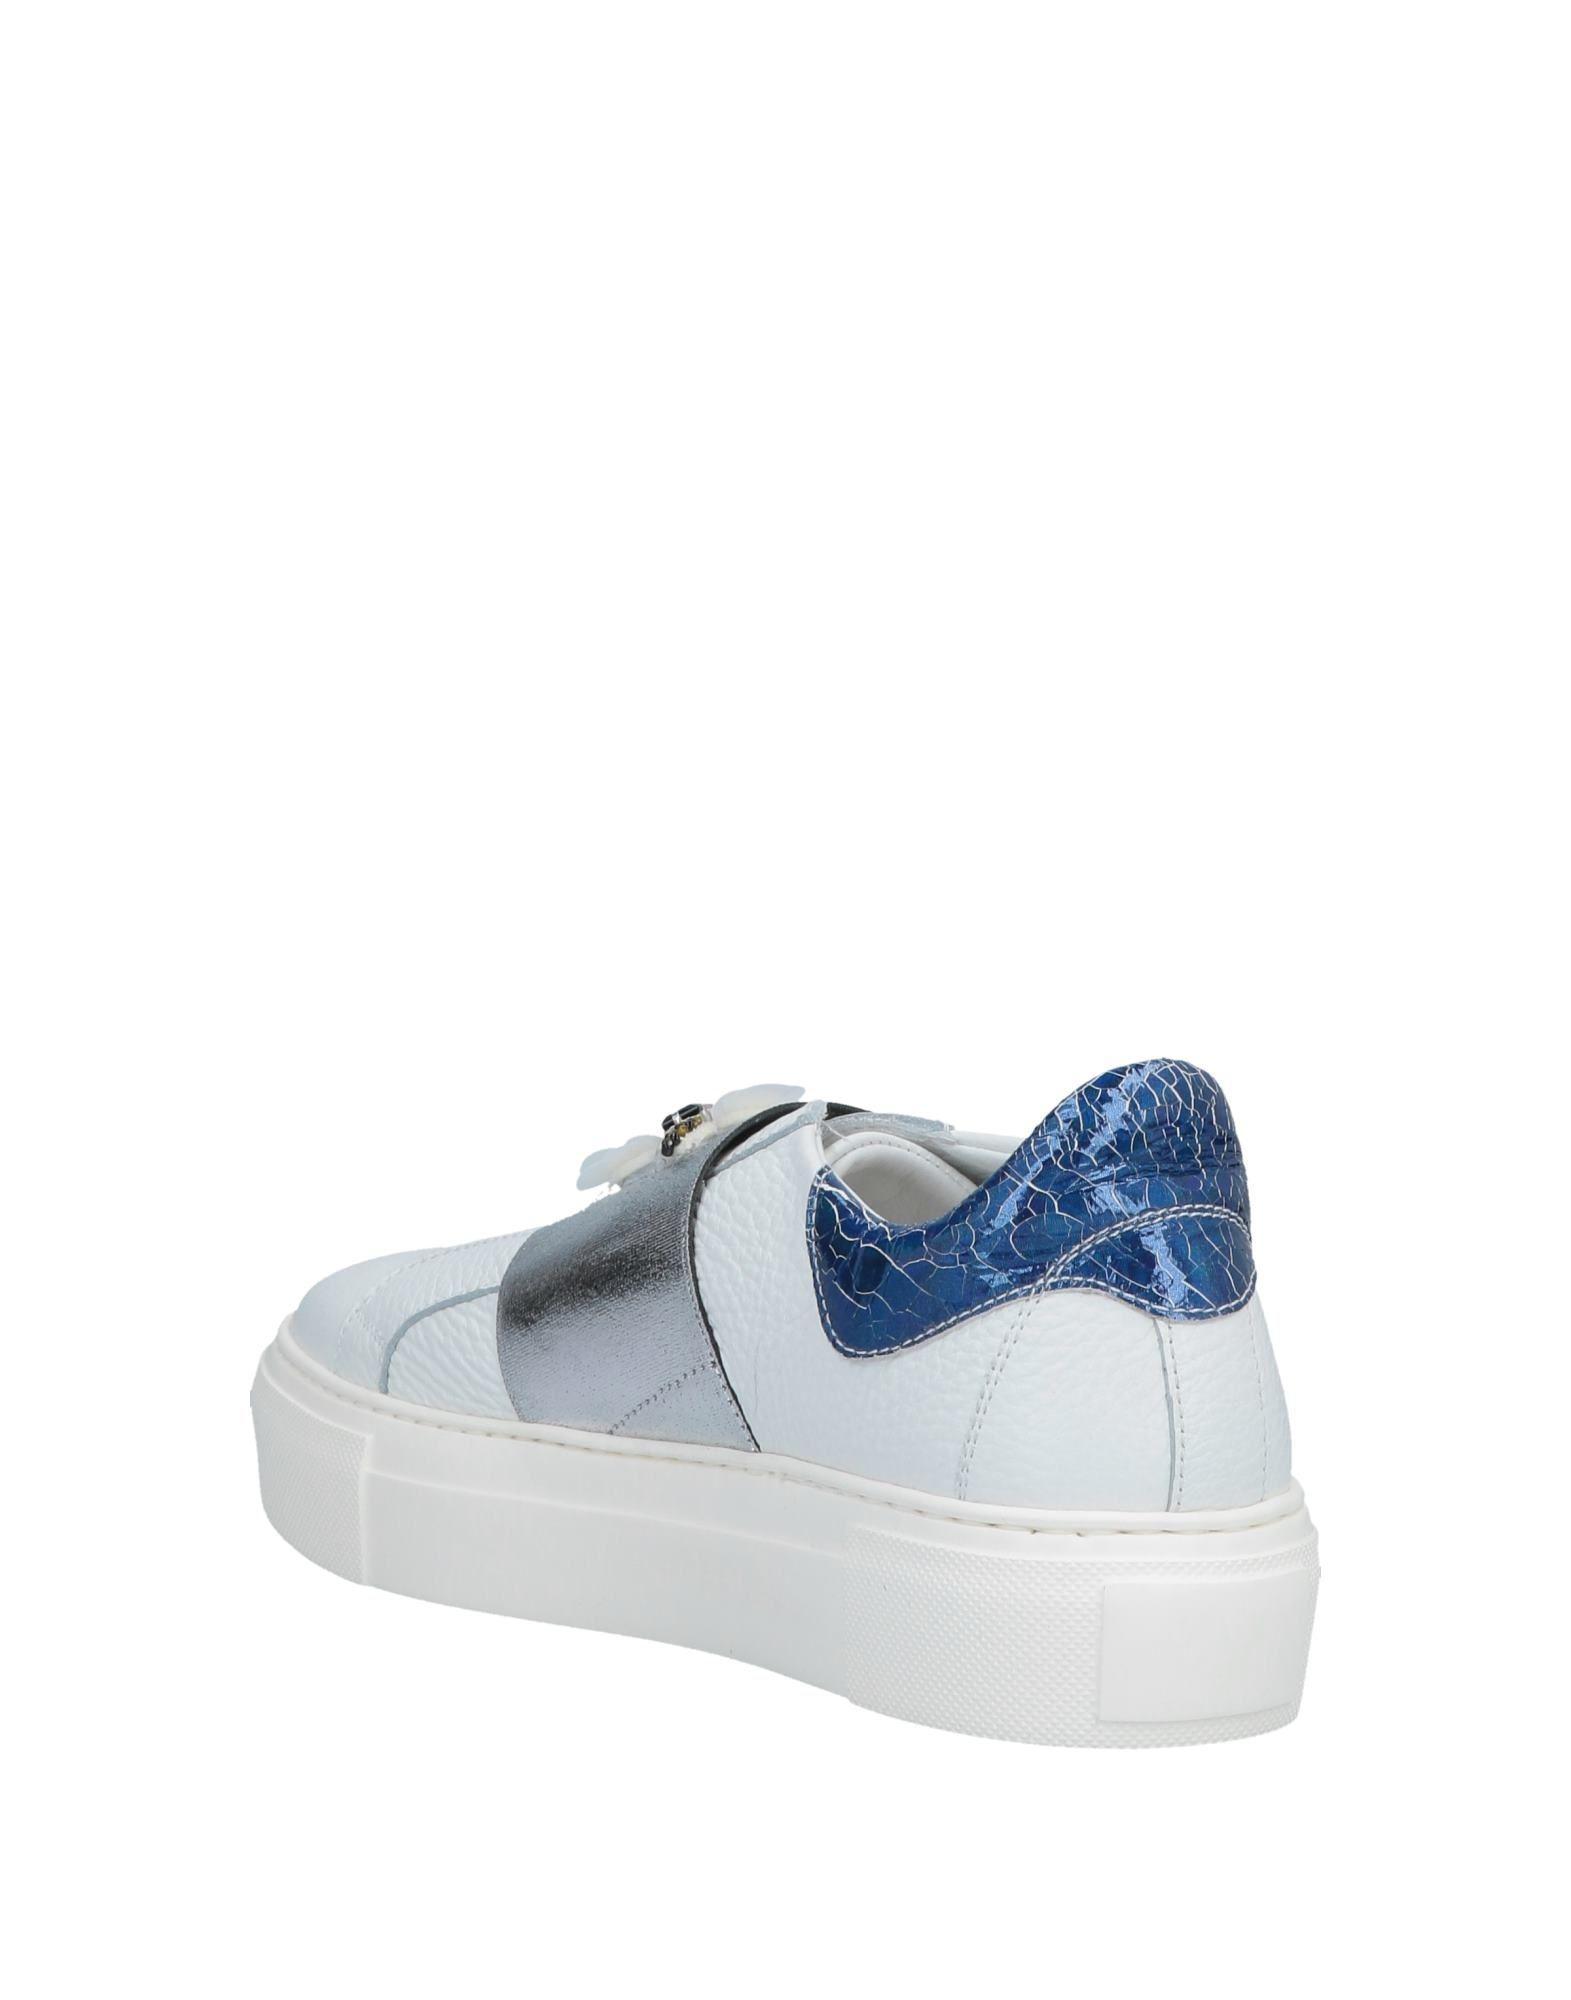 93bb7e684825 Lyst - D Acquasparta Low-tops   Sneakers in White